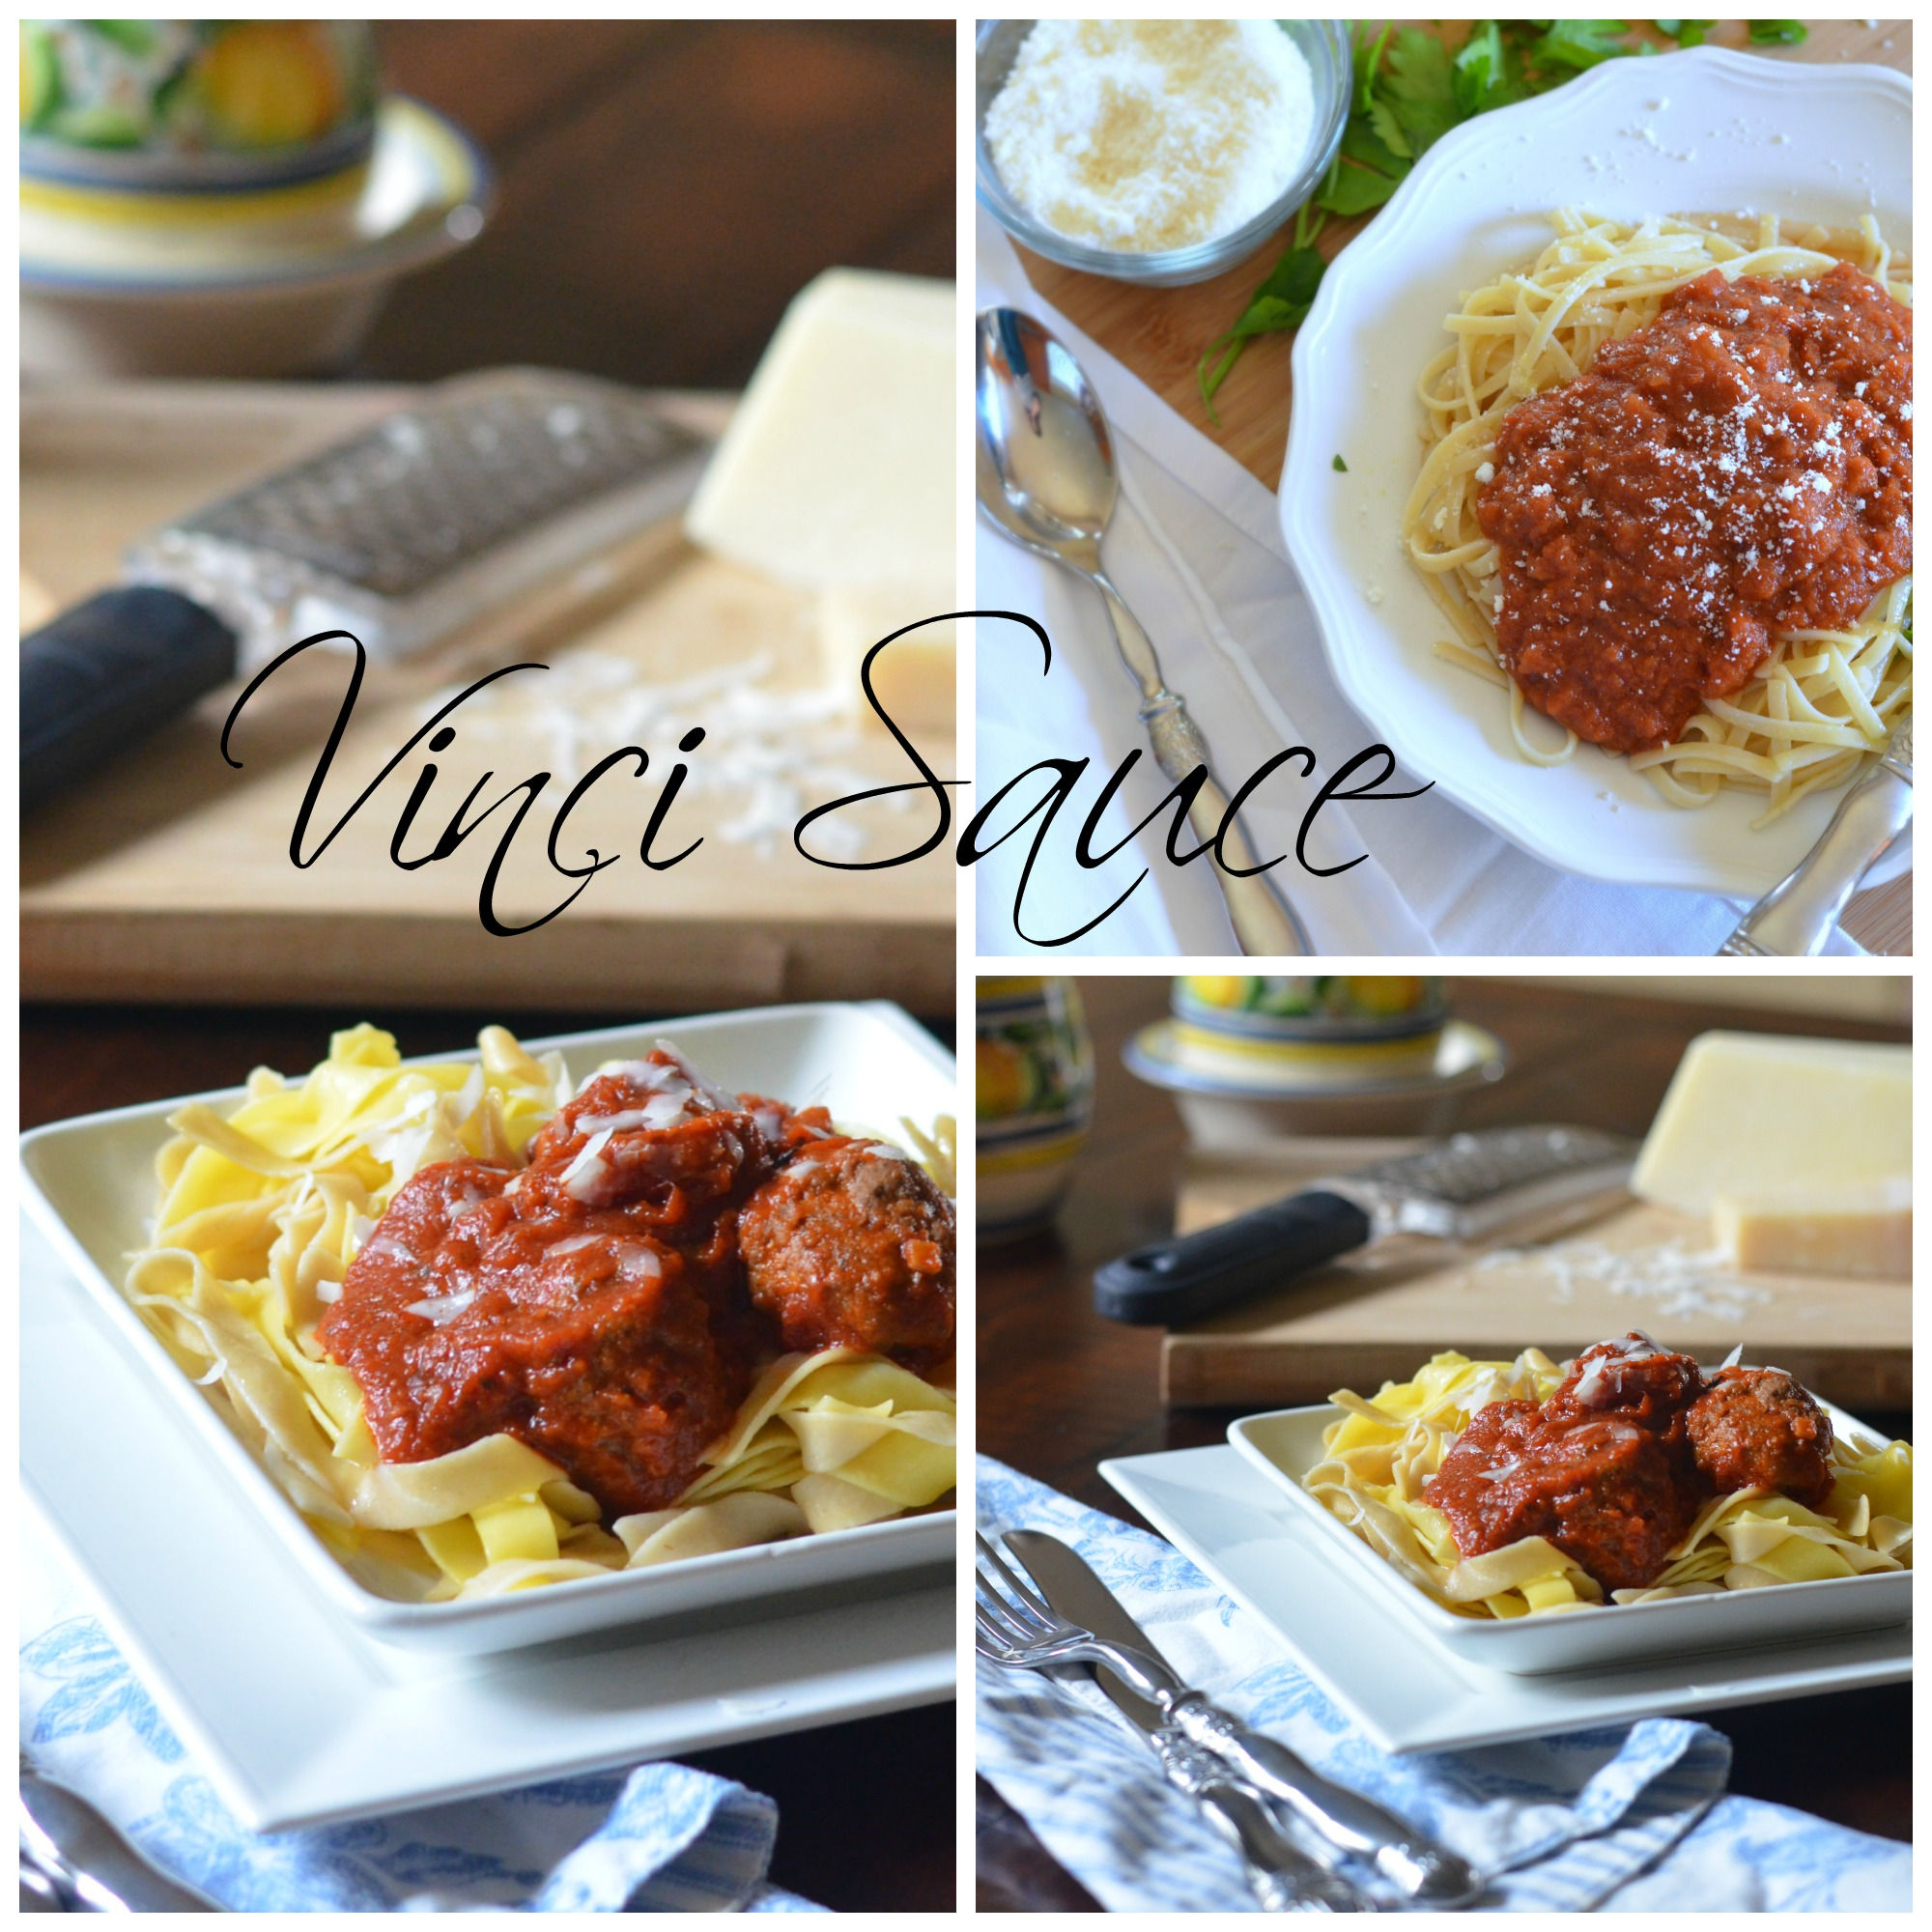 Vinci tomato sauce and meatballs collage